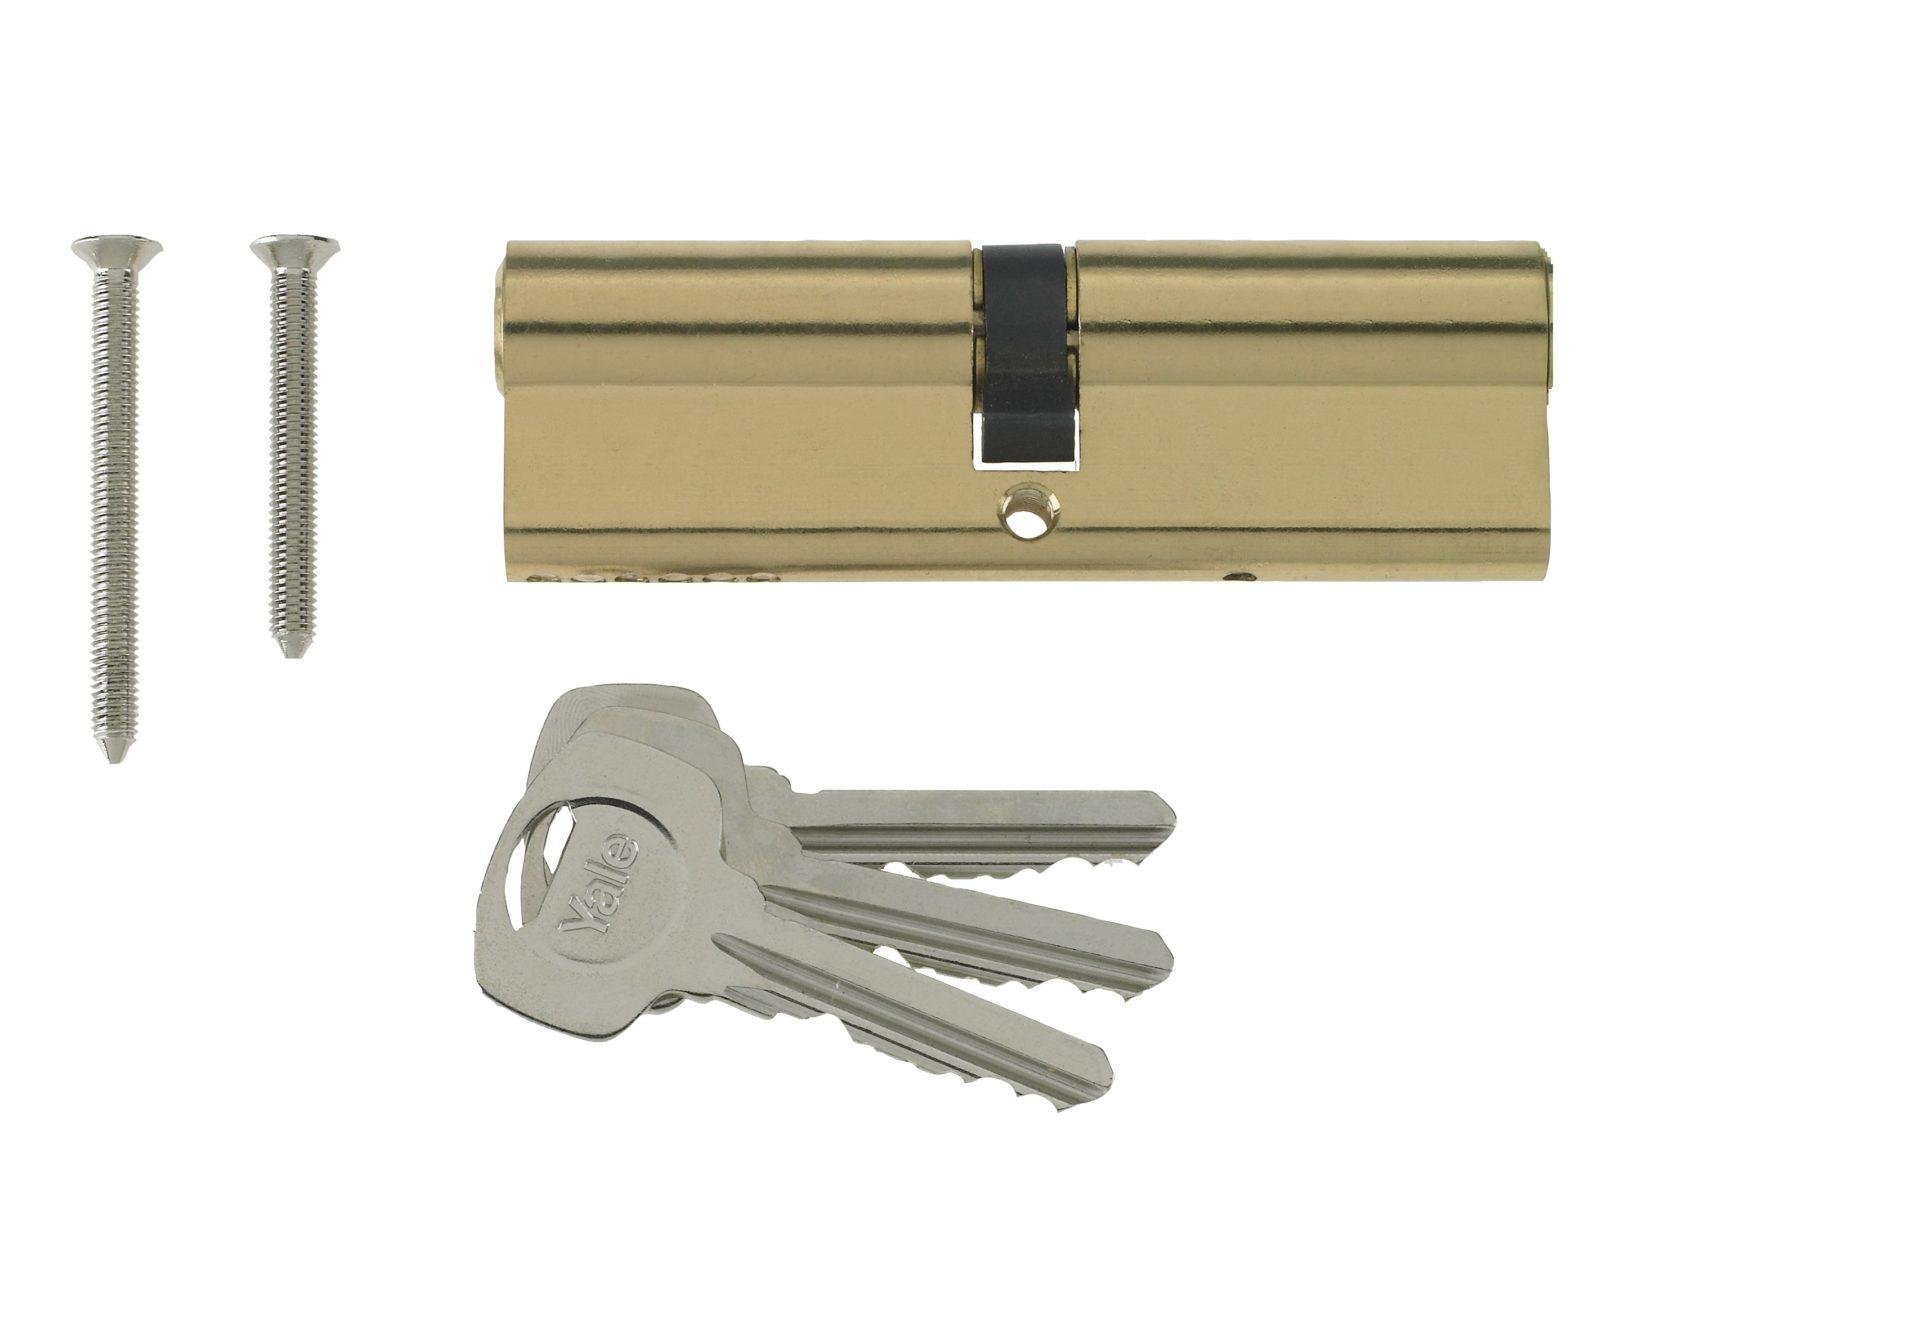 Yale 6 Pin Euro Profile Cylinder Lock Brass 45/45 (90mm) C/w 3 Keys